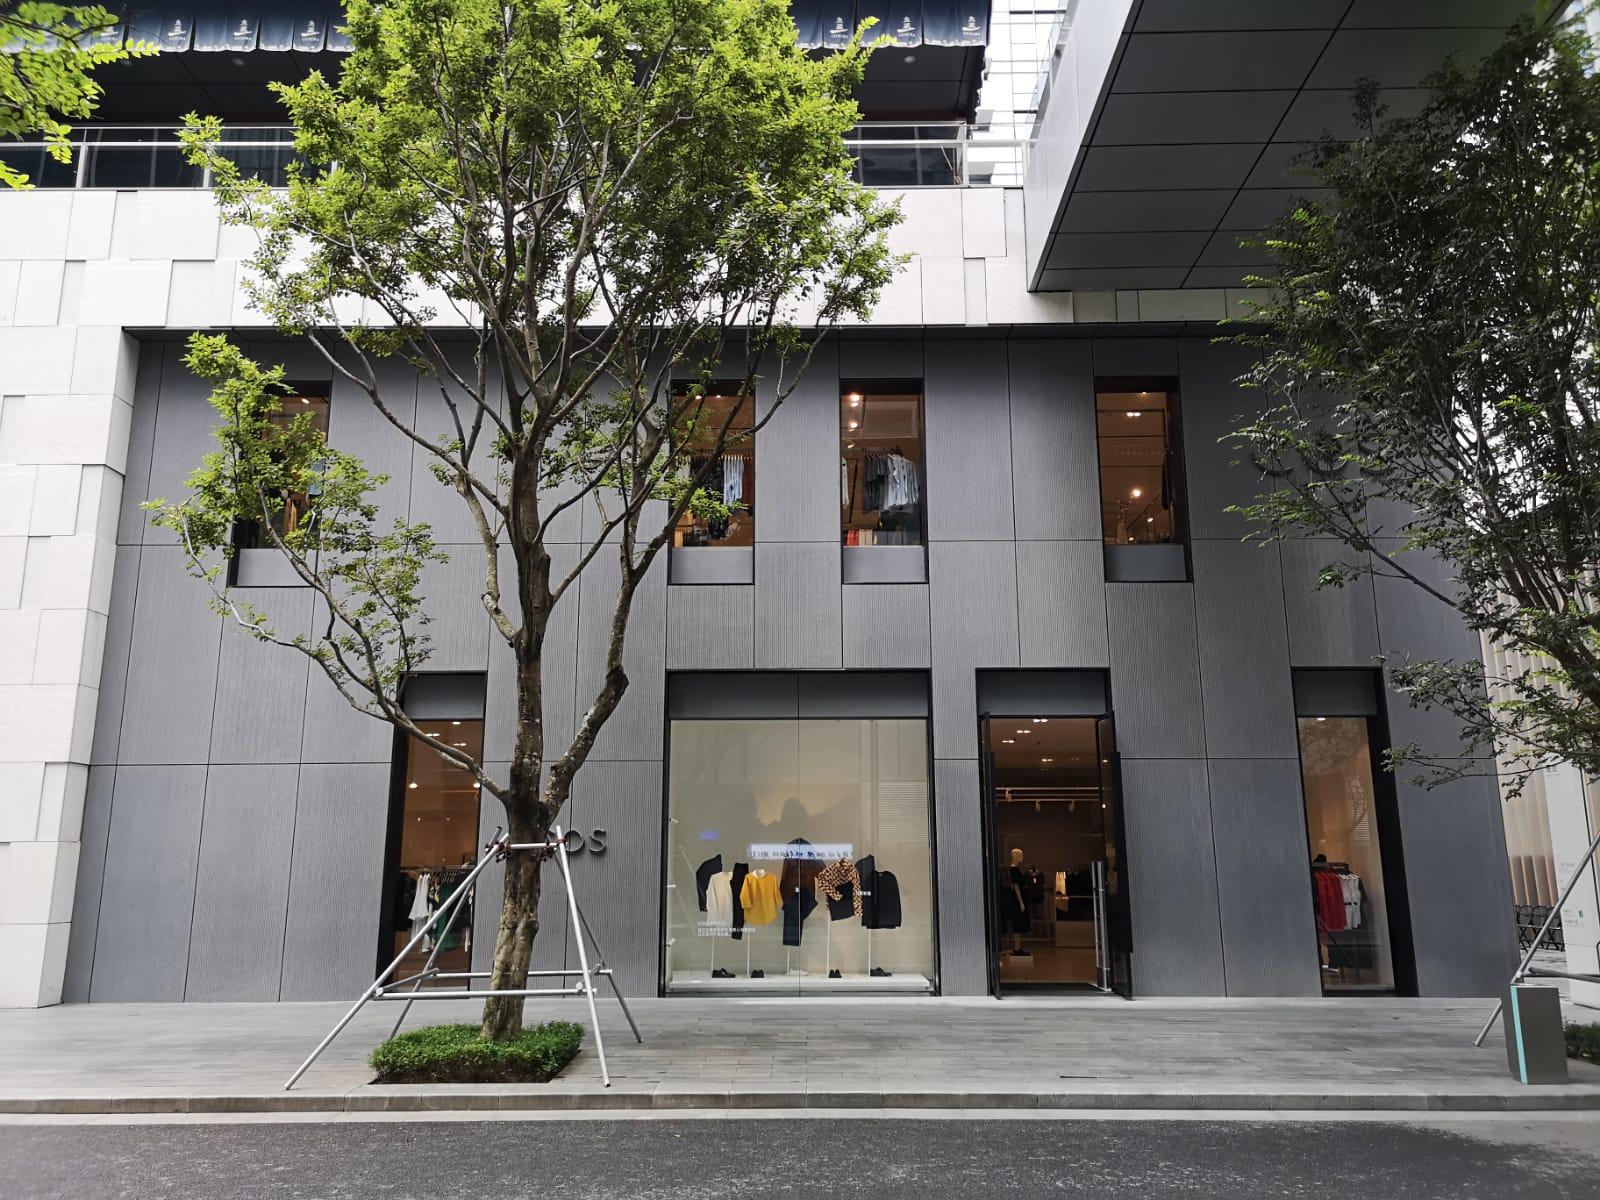 COS Flagship Store Shenzhen